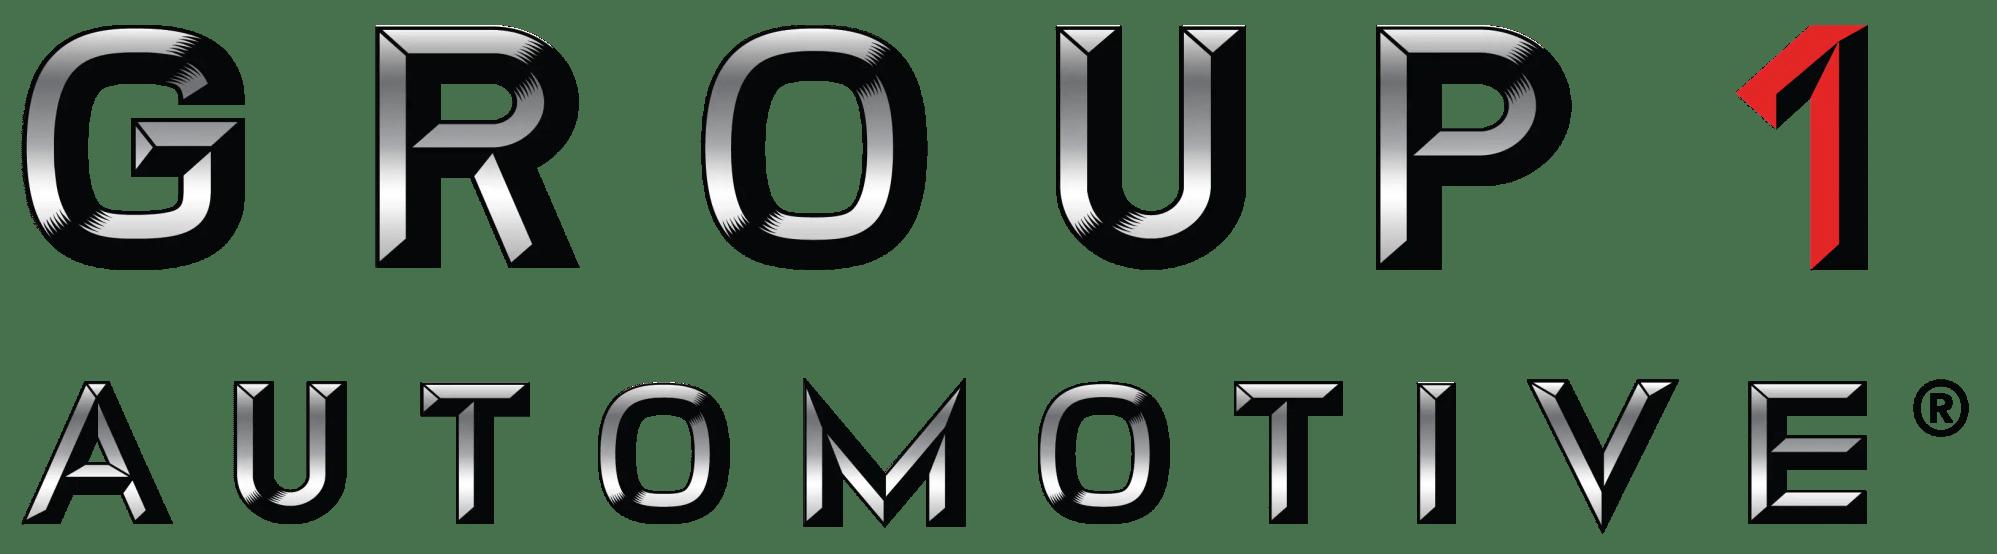 hight resolution of group 1 automotive logo group 1 automotive new volkswagen lexus mini